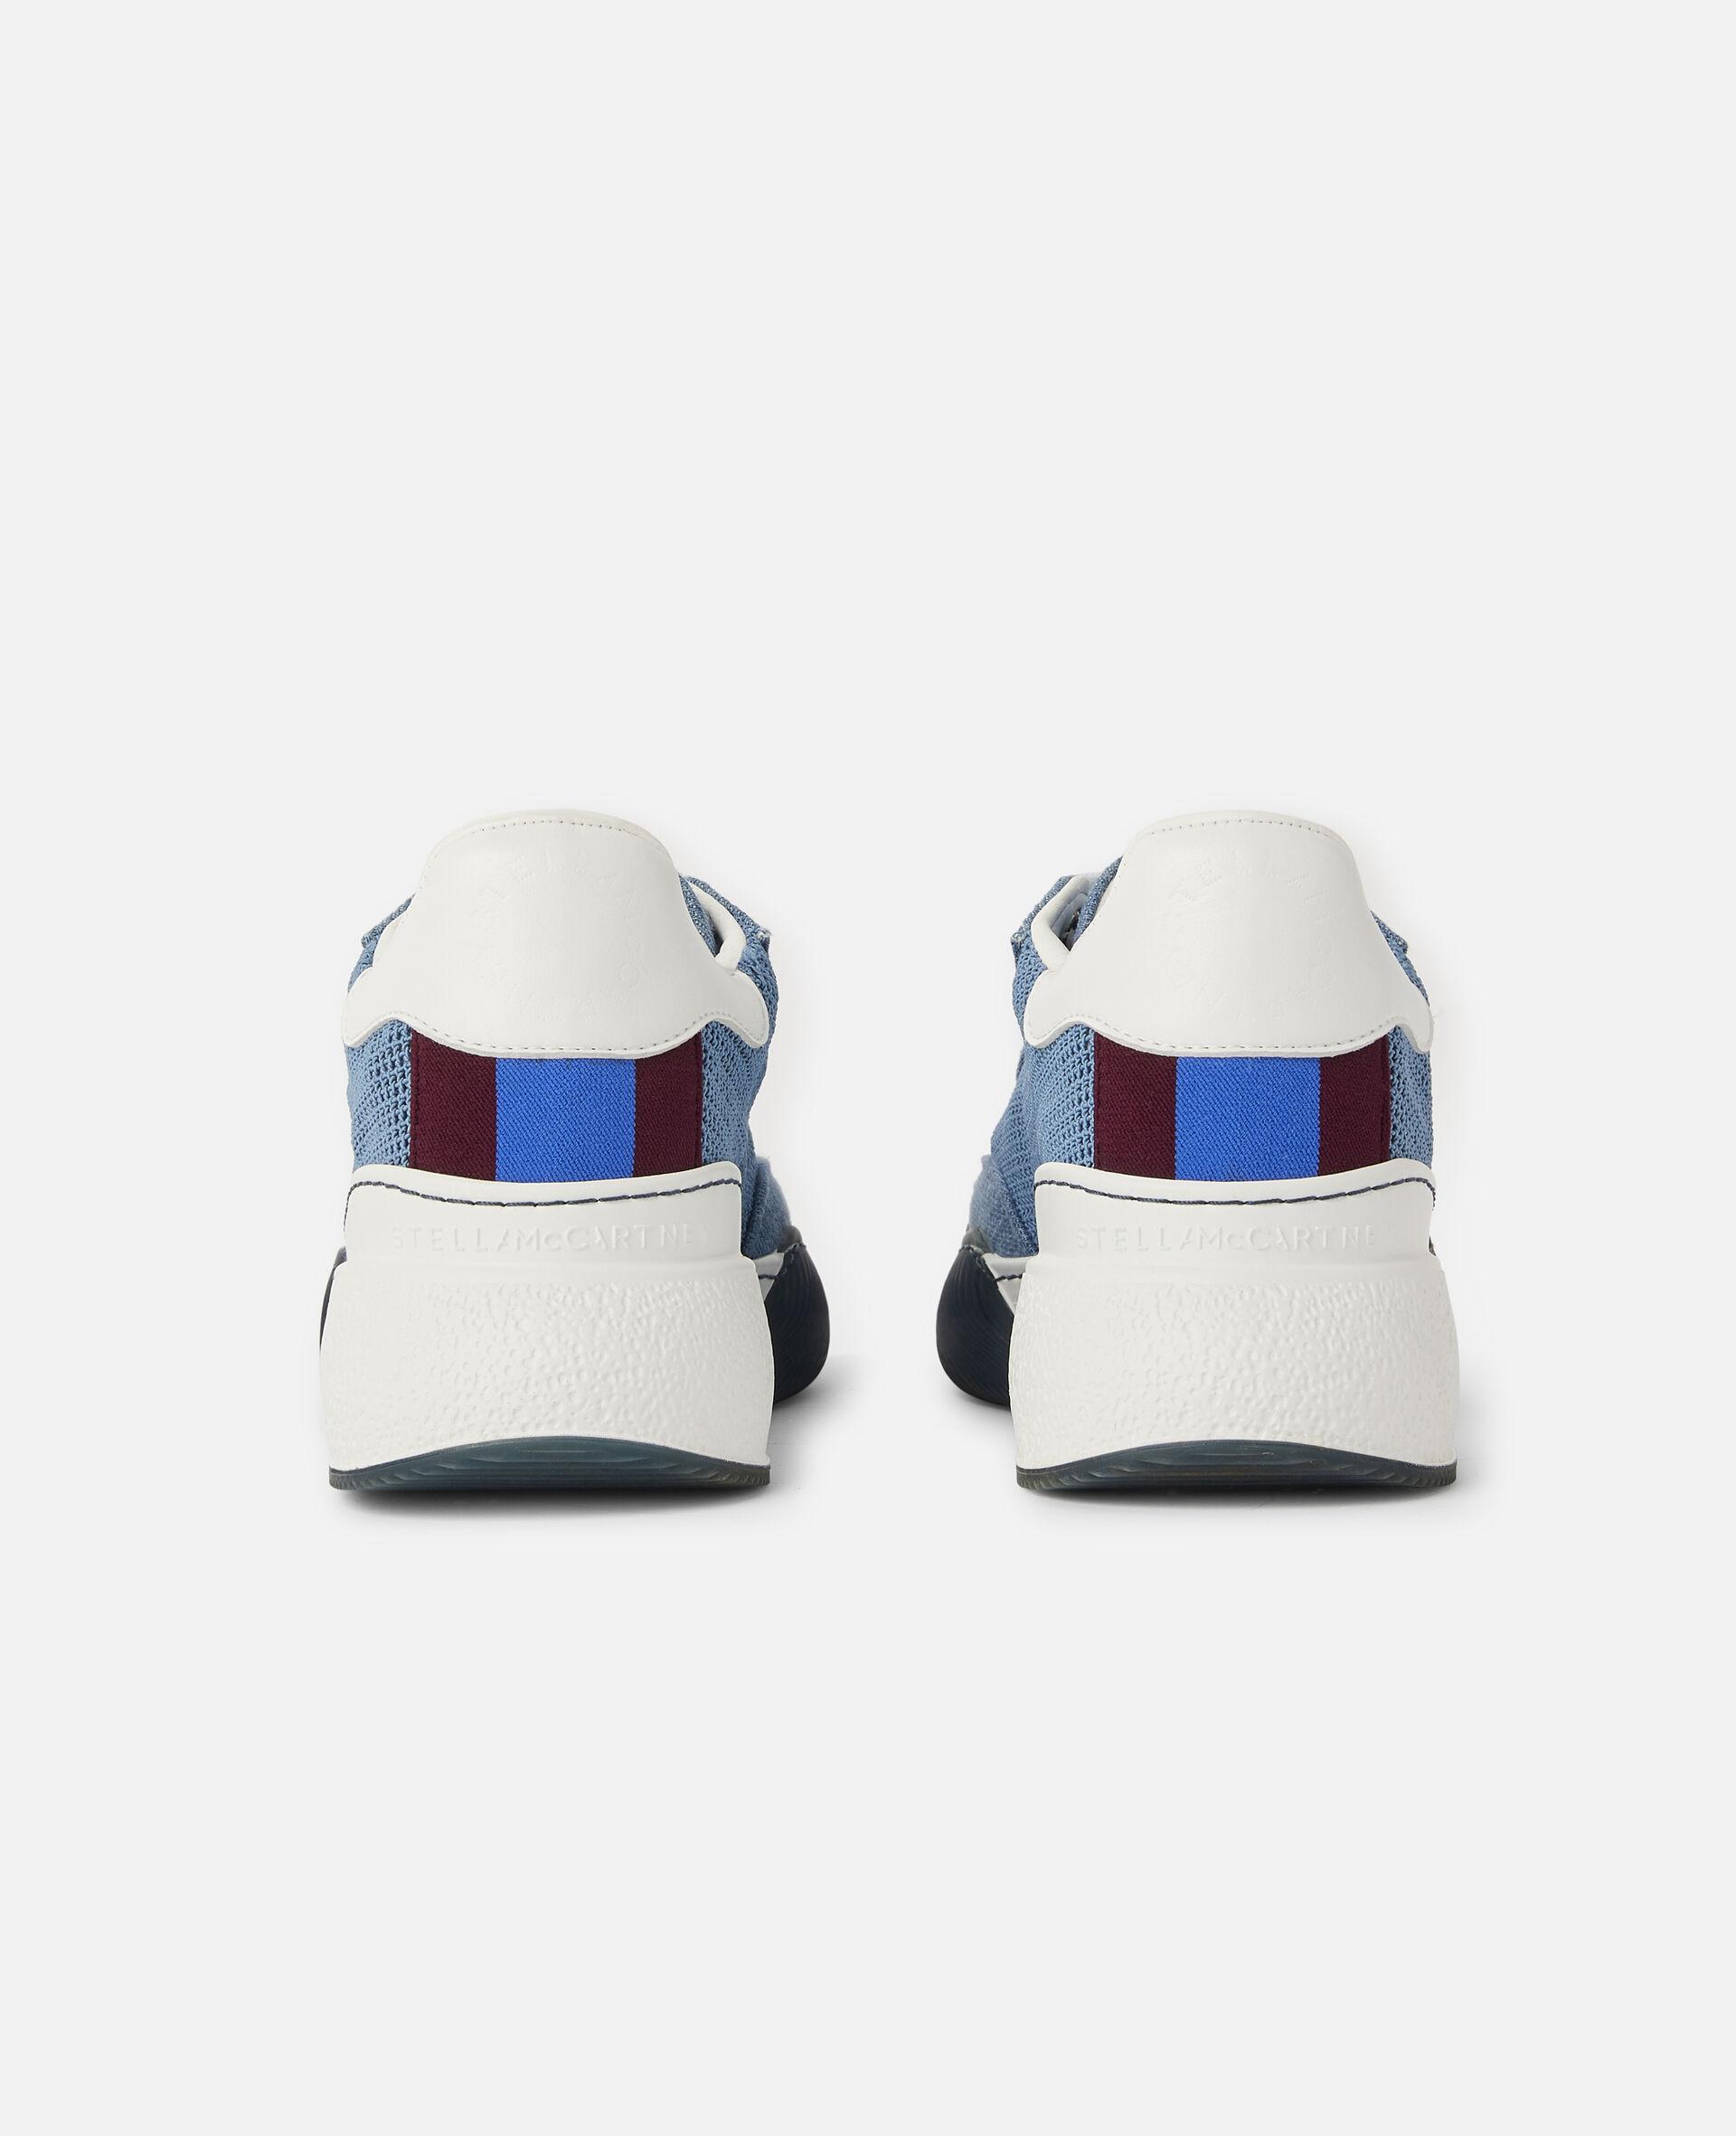 Loop Square Mesh Sneakers -Blue-large image number 2